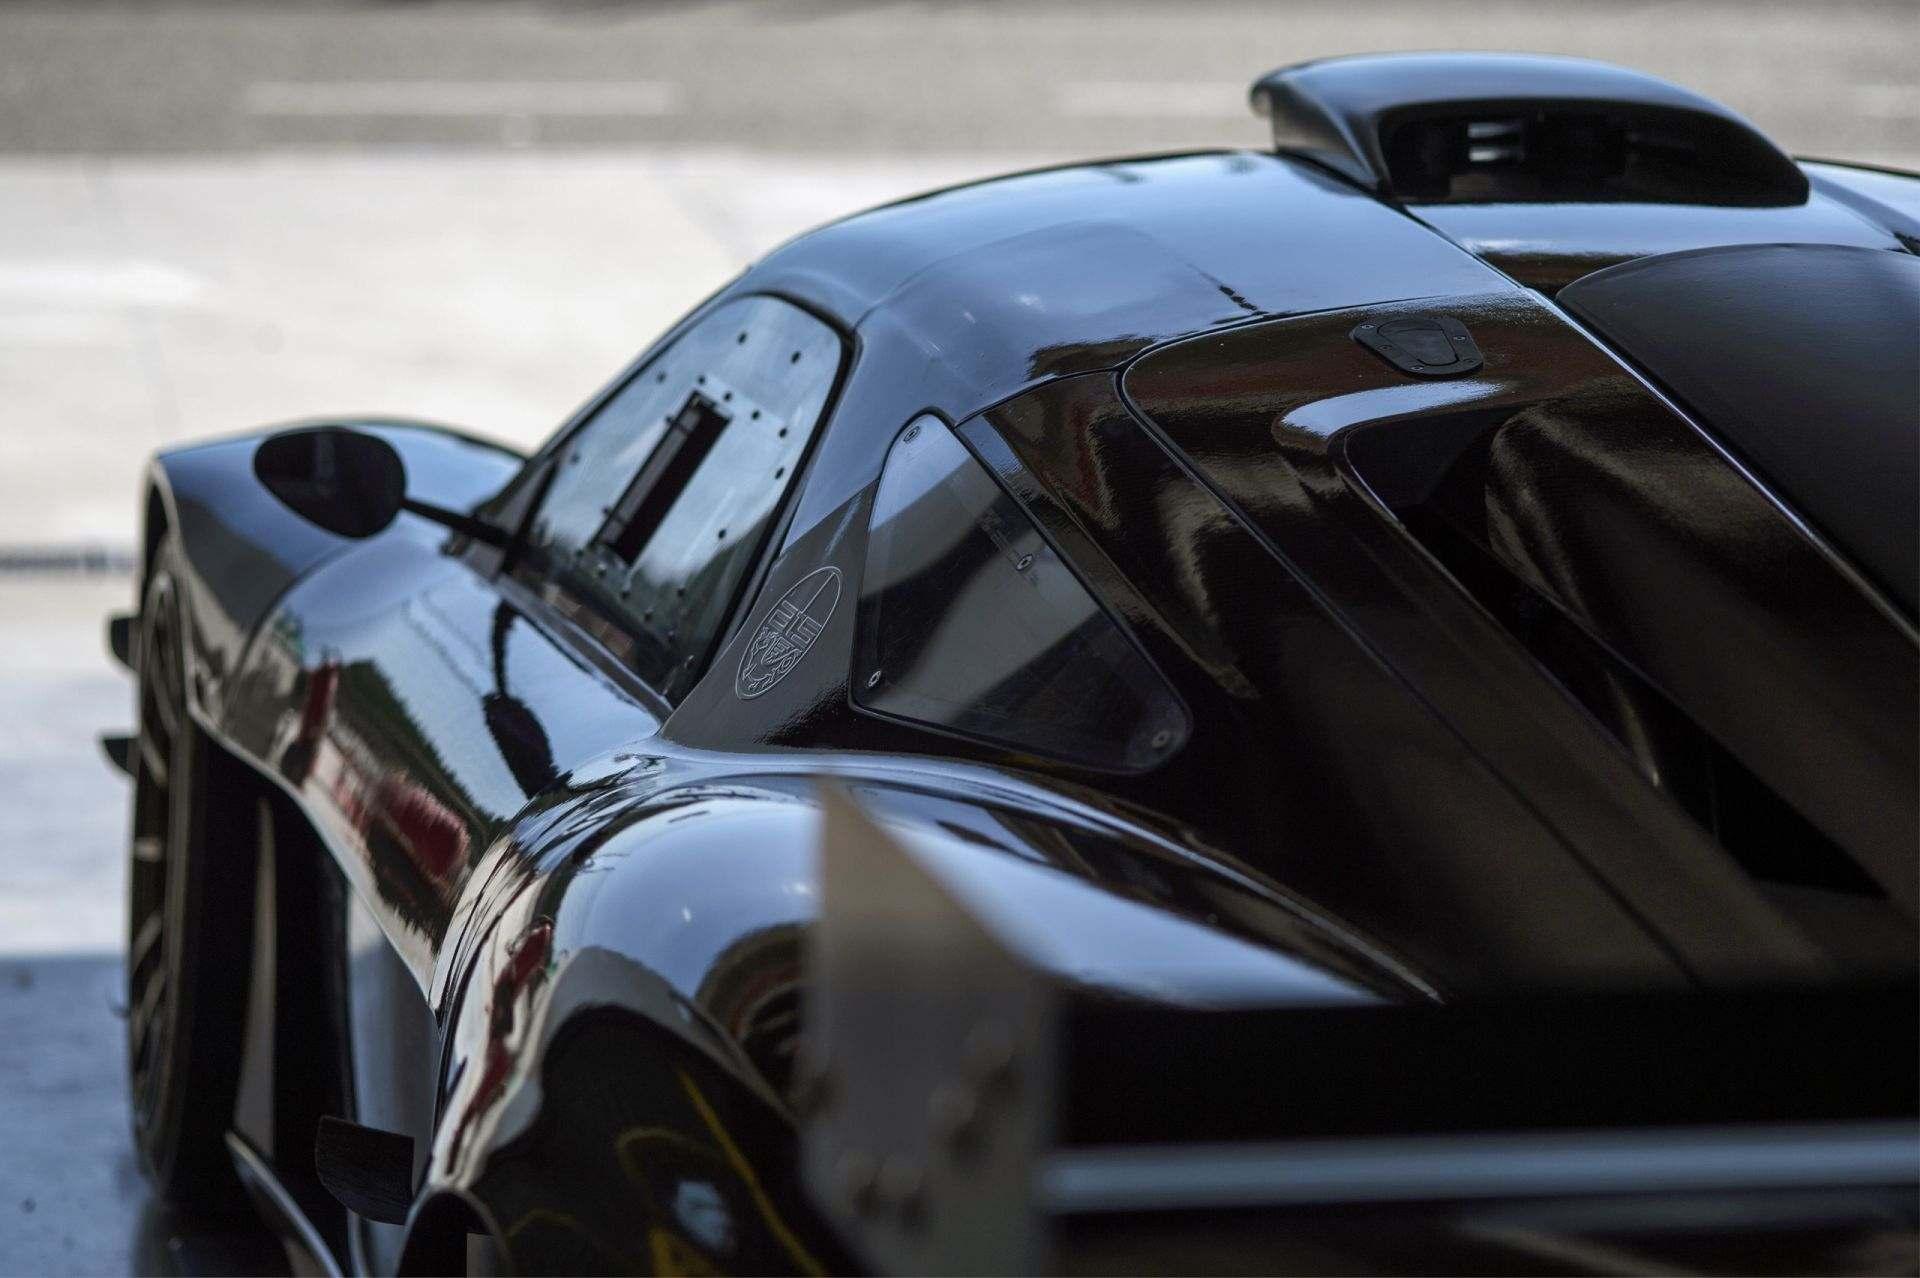 ATS-Corsa-RR-Turbo-Serie-Carbonio-14